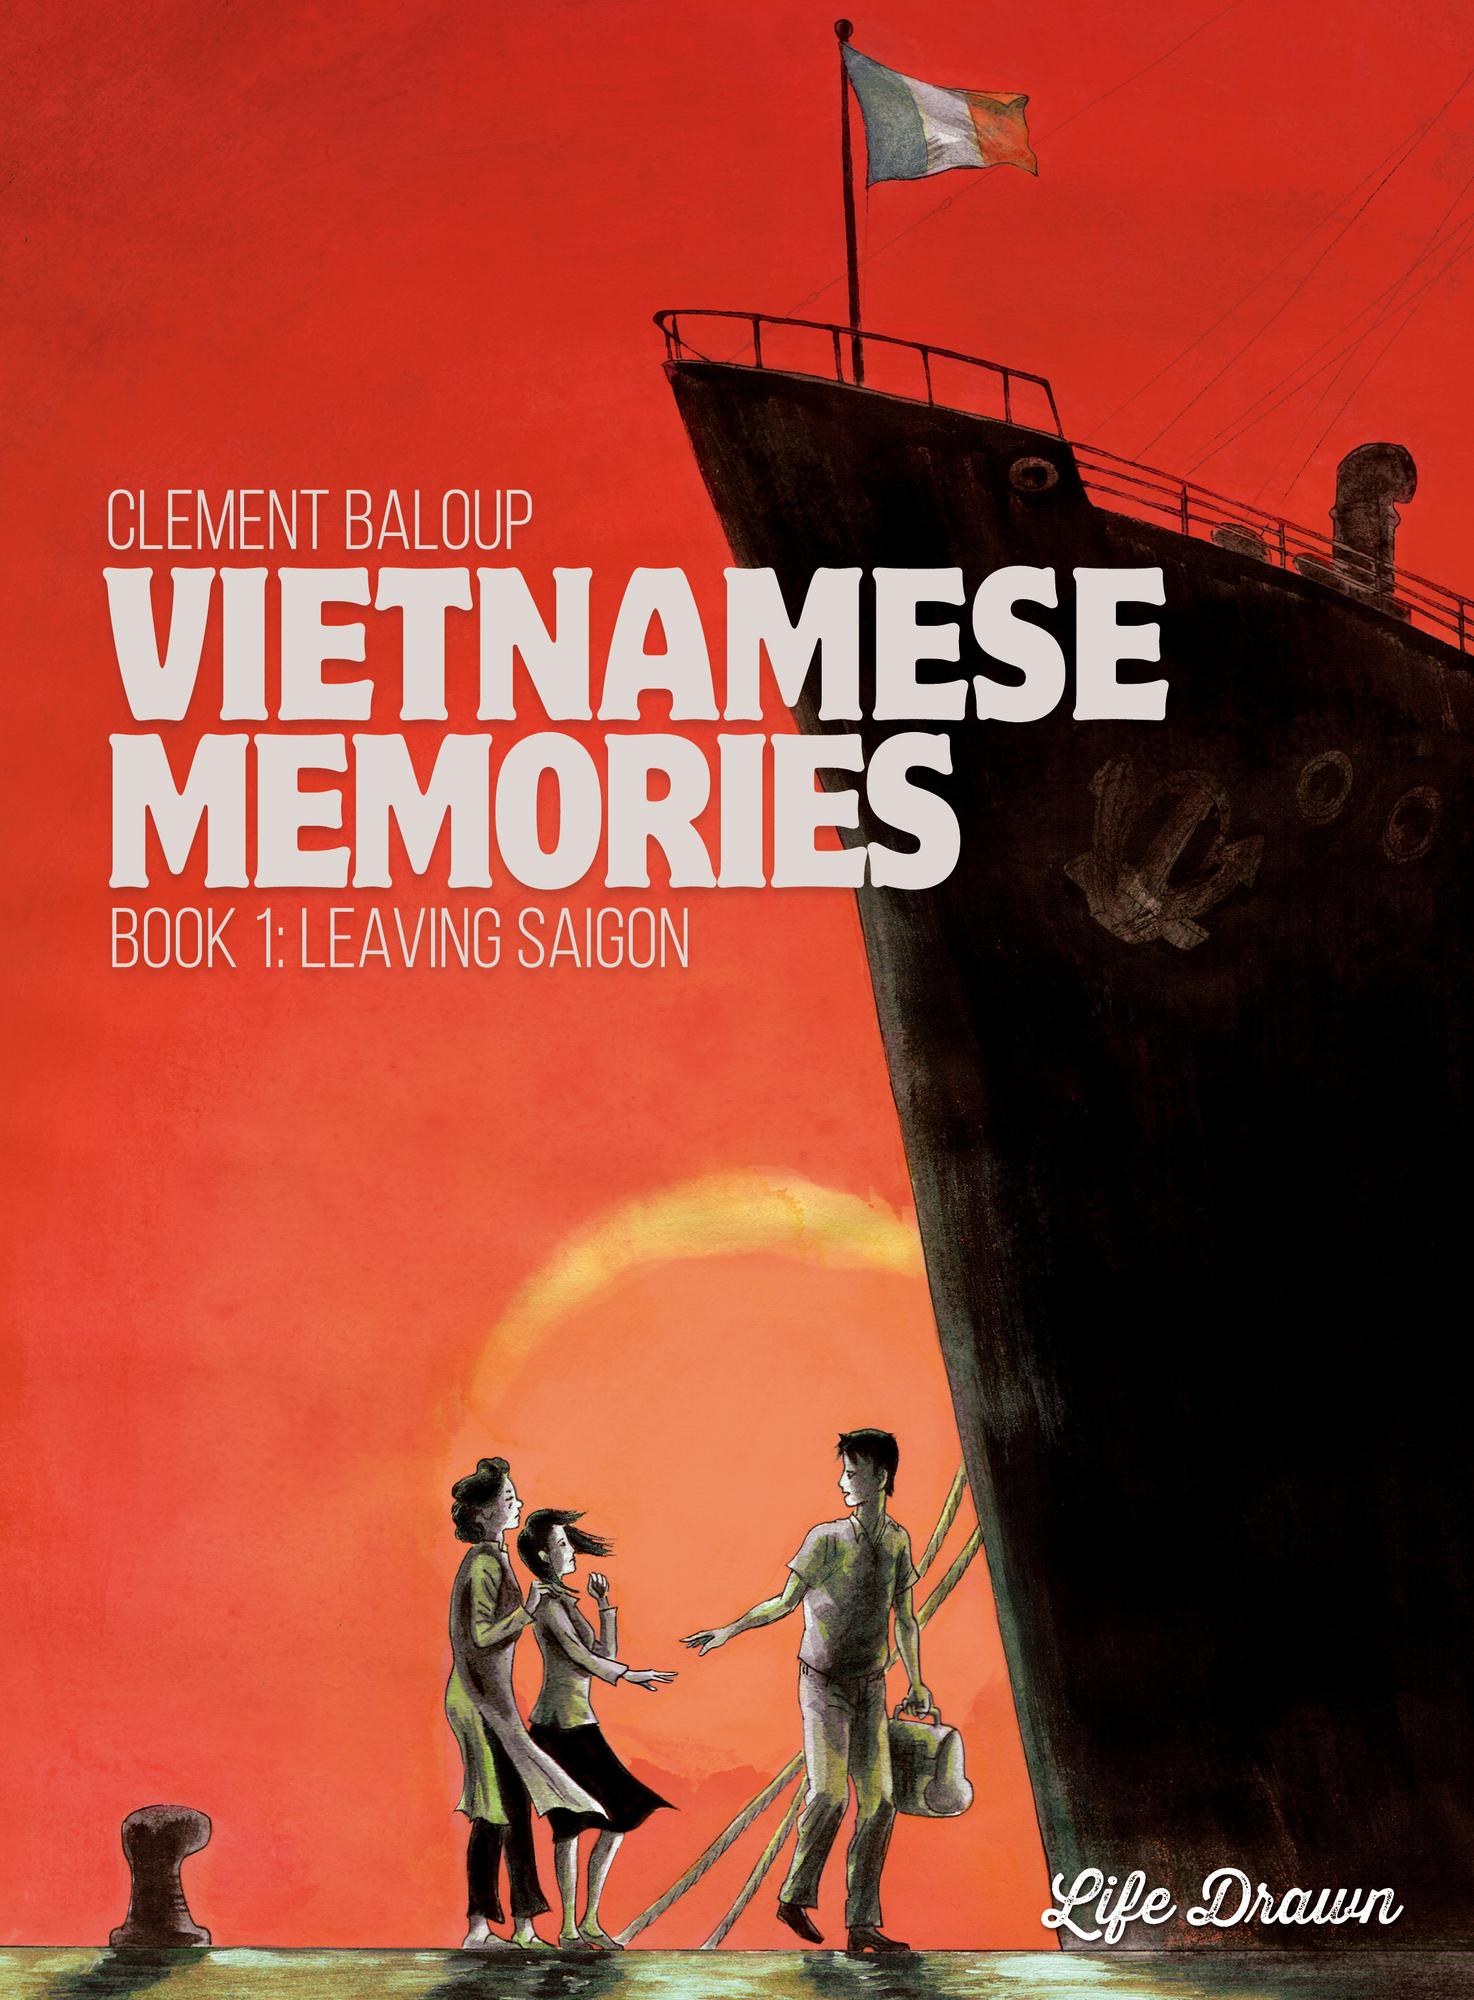 VIETNAMESE MEMORIES ST #1-COVER.jpg